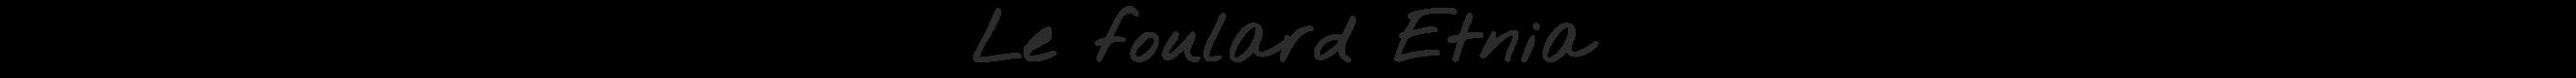 http://lookbook.allee-du-foulard.fr/wp-content/uploads/2018/05/0662-ADF-Accessoires-de-mode-LB-Coll-Titre-Etnia-2650x80.png